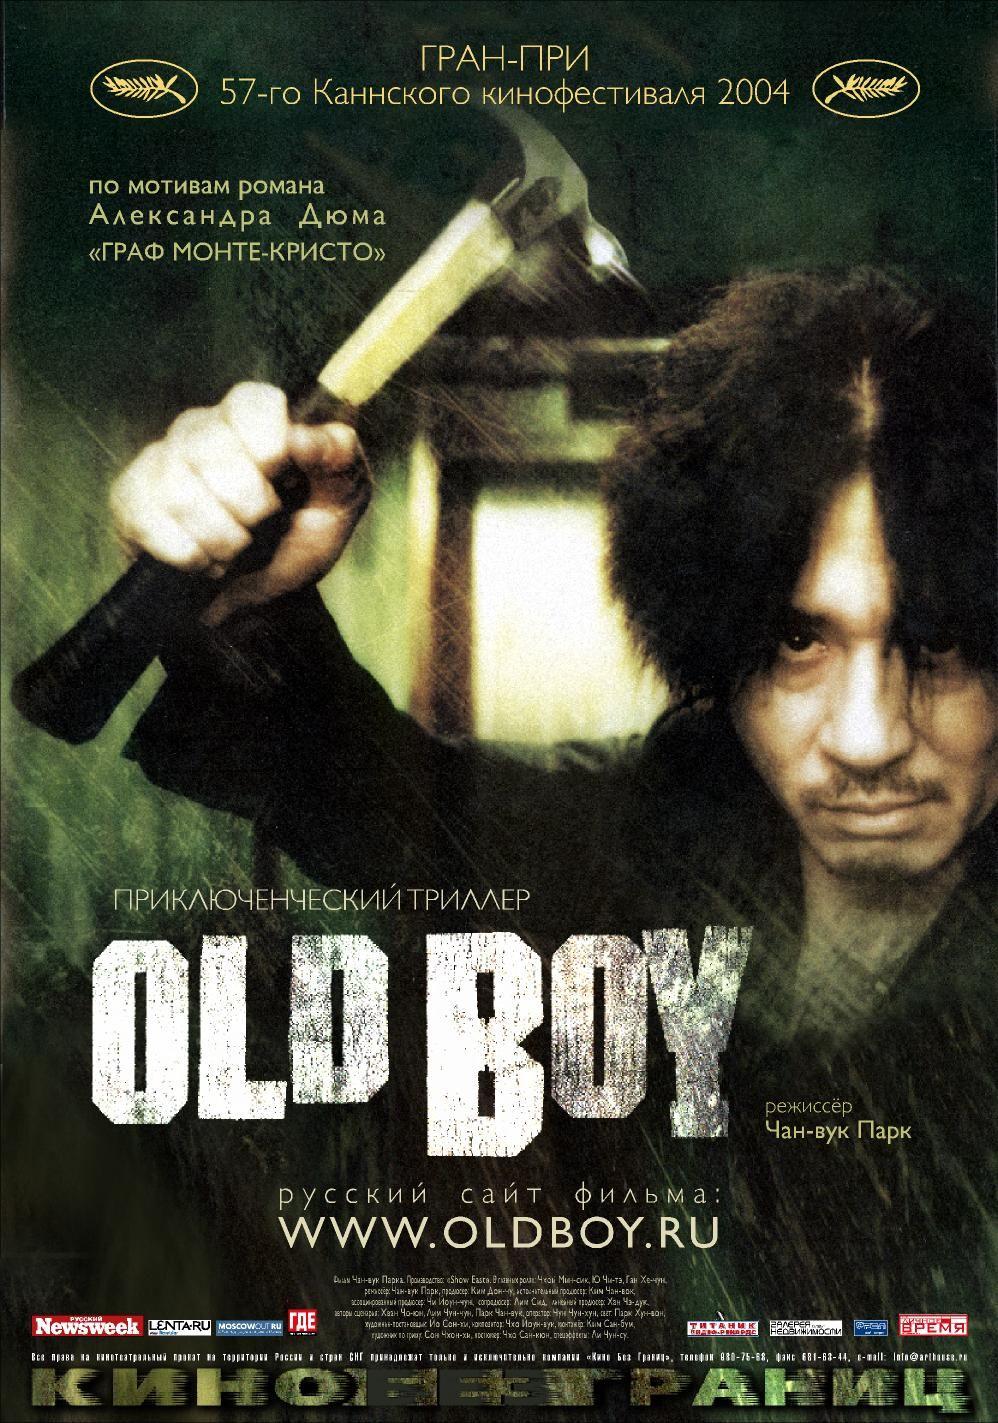 oldboy english subtitles